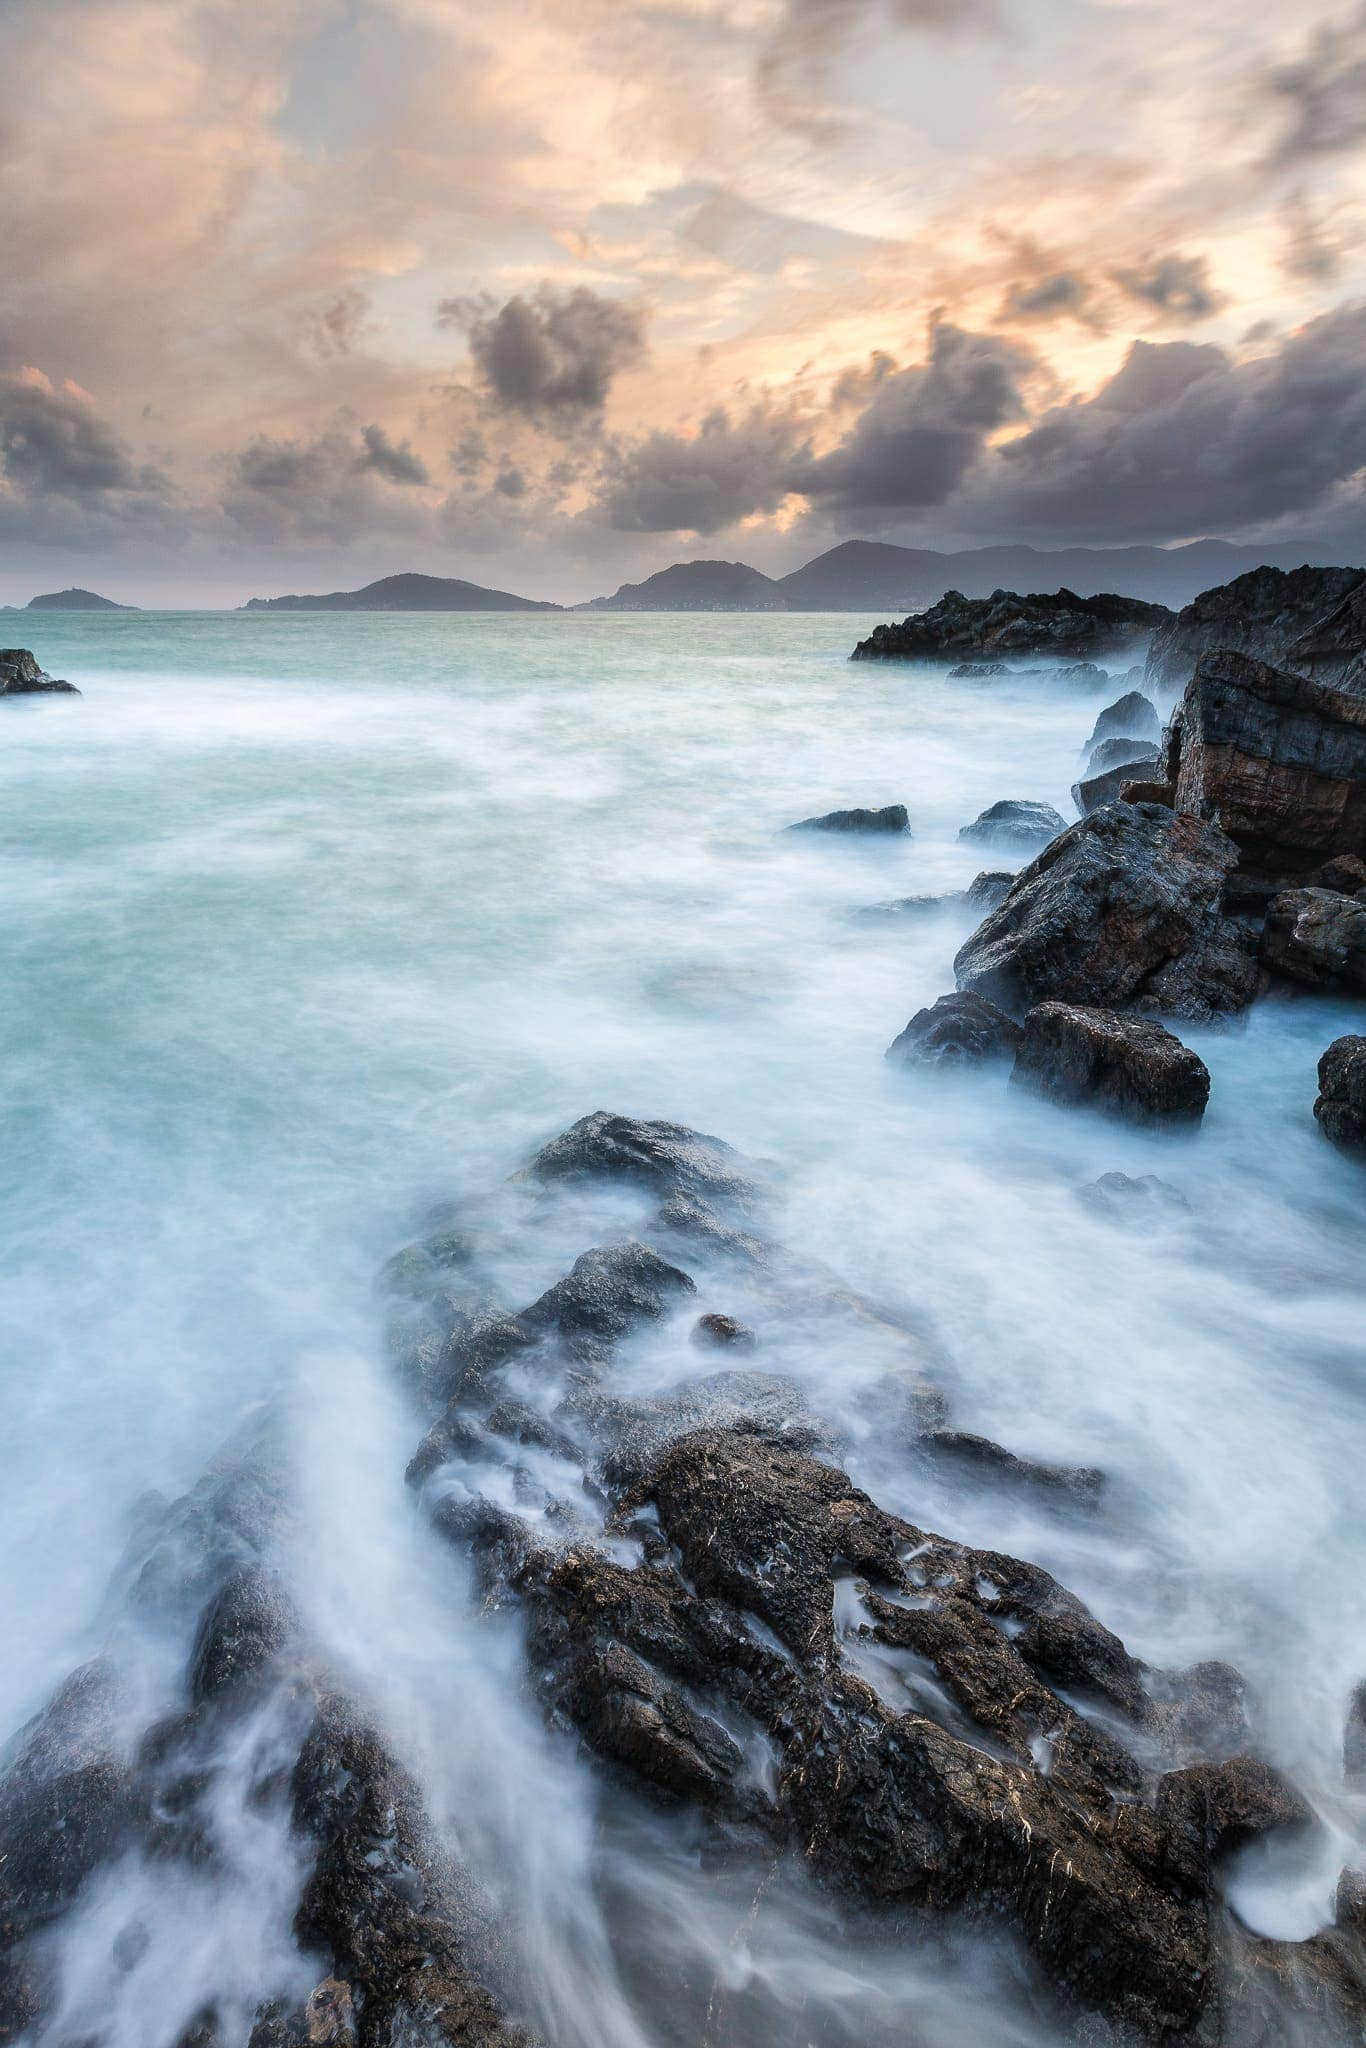 Francesco Gola Seascape Landscape Photography Tellaro Summer Storm Long Exposure